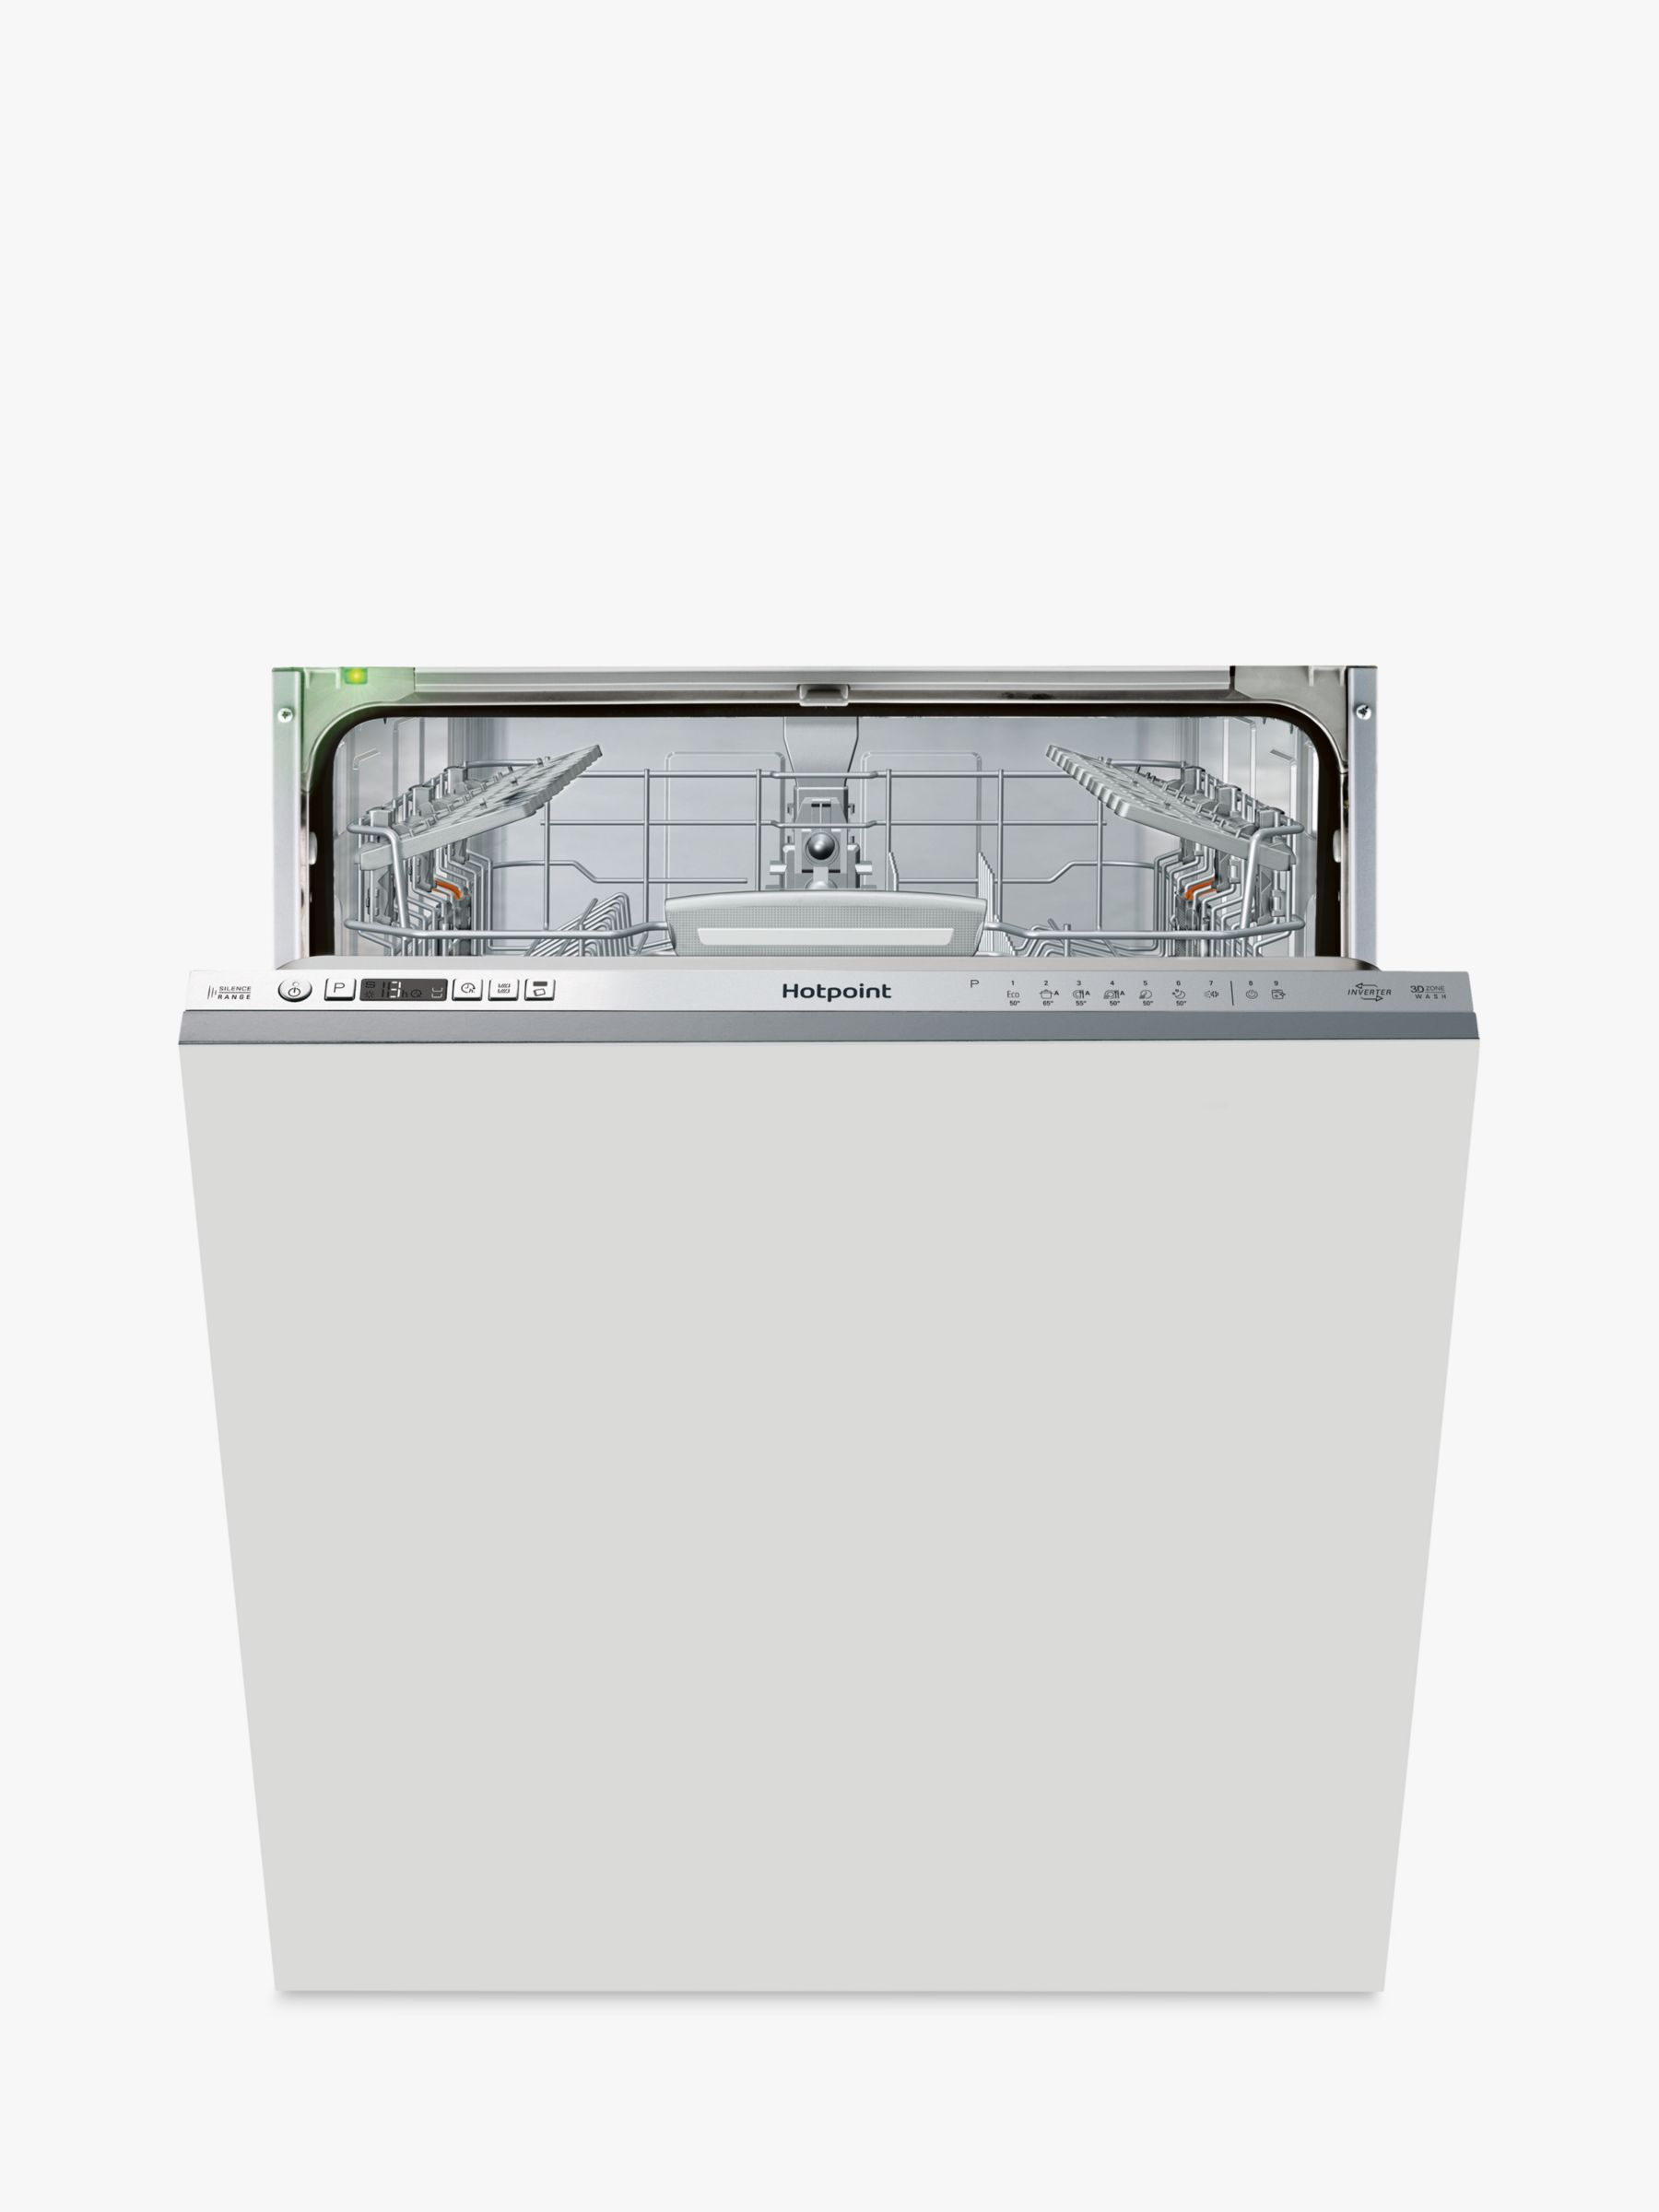 Hotpoint Hotpoint HIO 3T1239 E Integrated Dishwasher, White